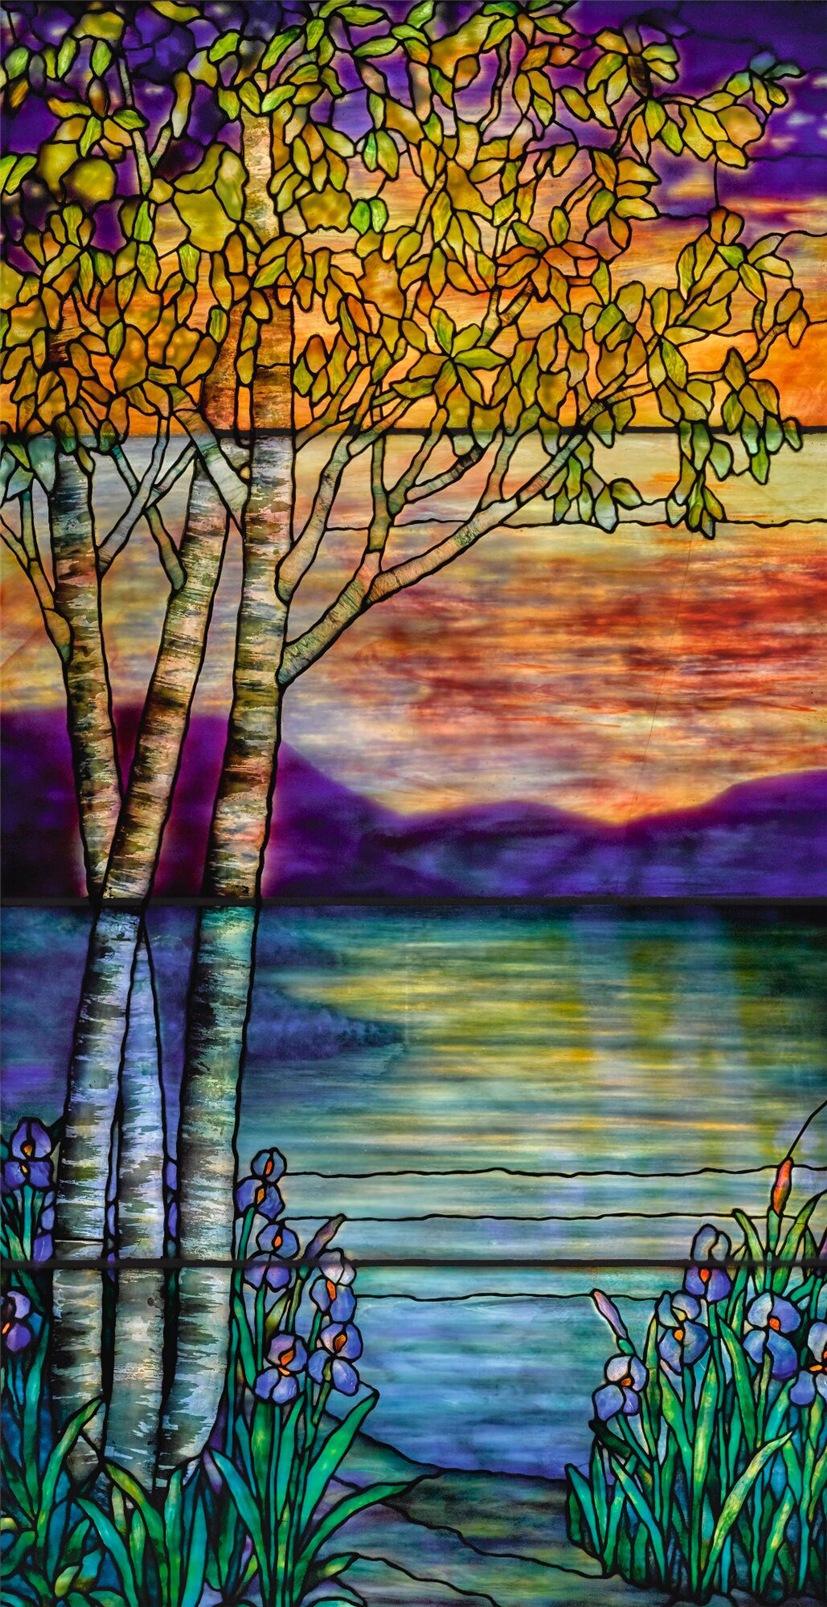 43-Ландшафтное окно Берёзы и ирисы - 1910-1915.jpg